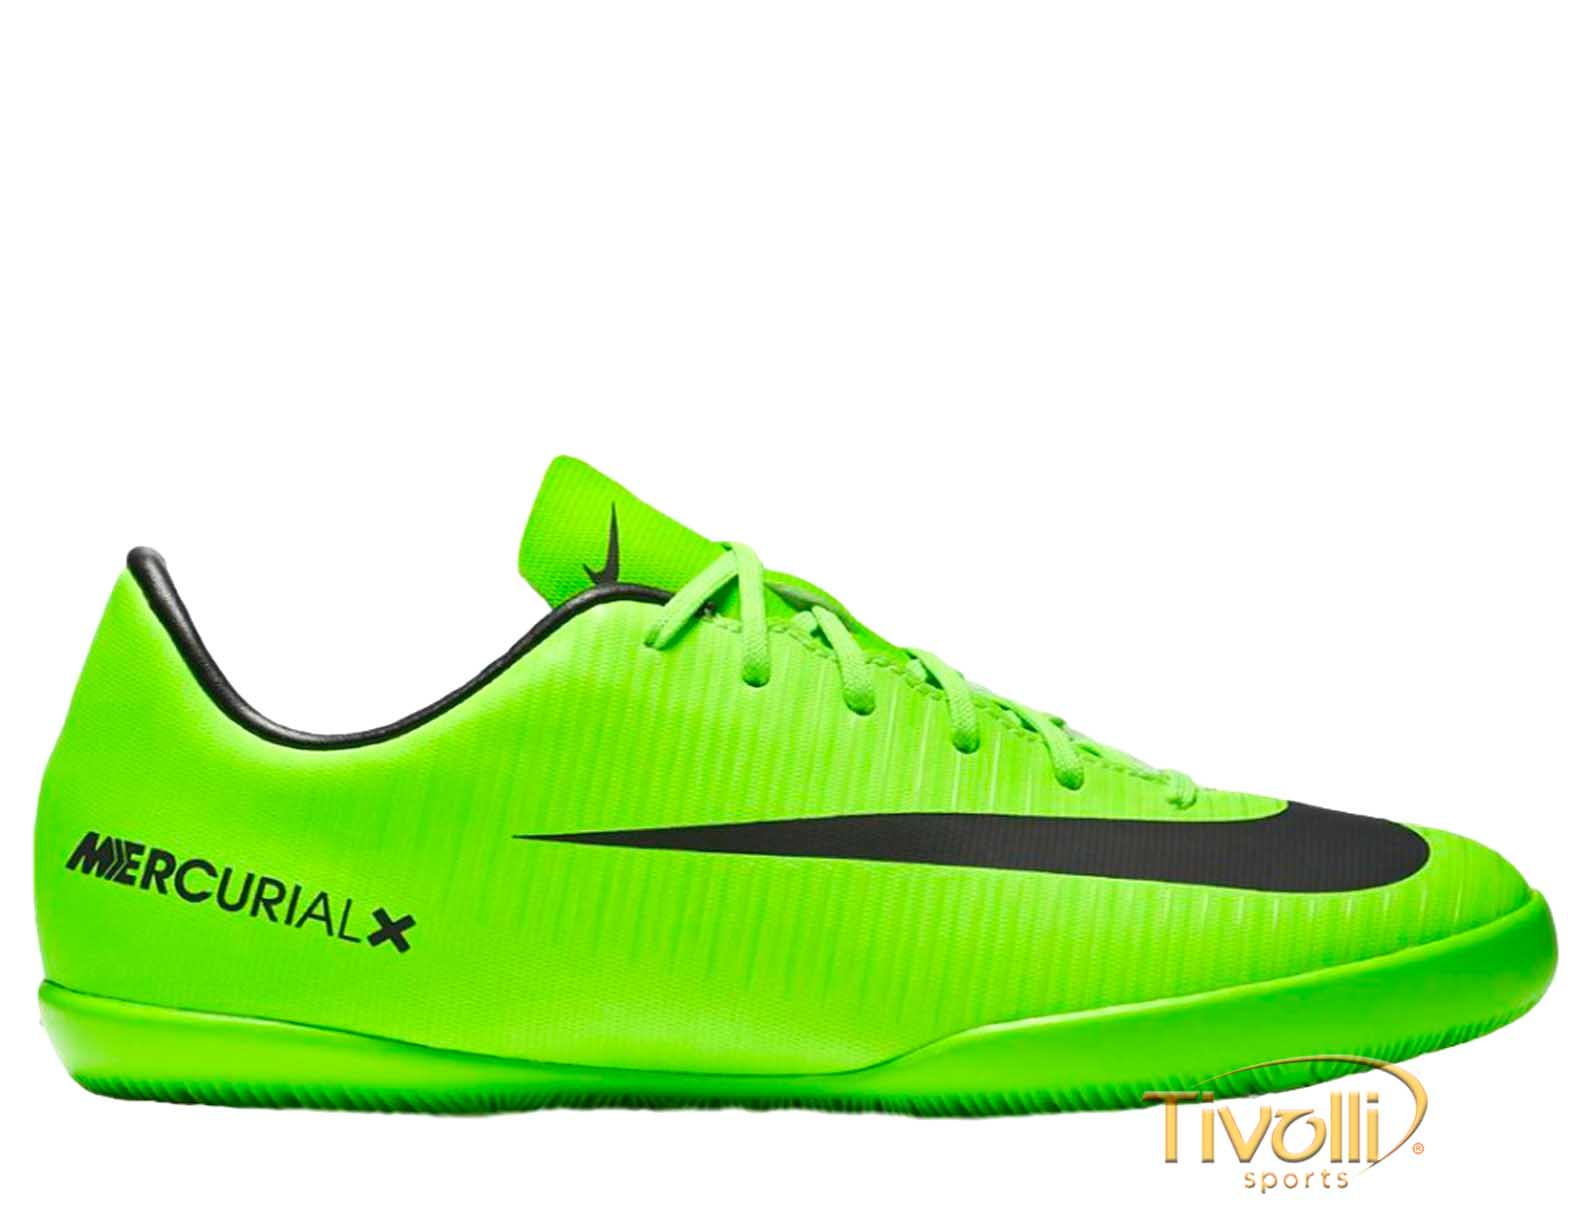 3656c4b20f533 Chuteira Nike Mercurial Vapor XI IC Futsal Infantil > >